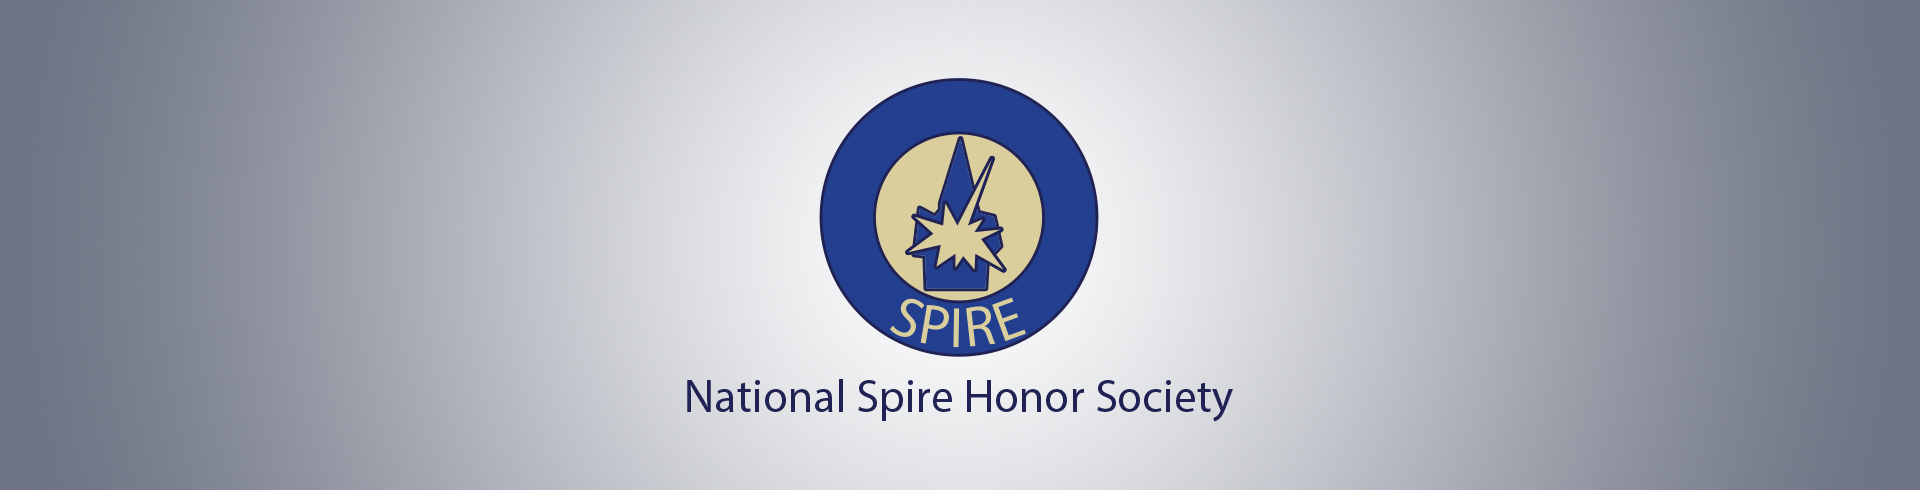 National Spire Honor Society